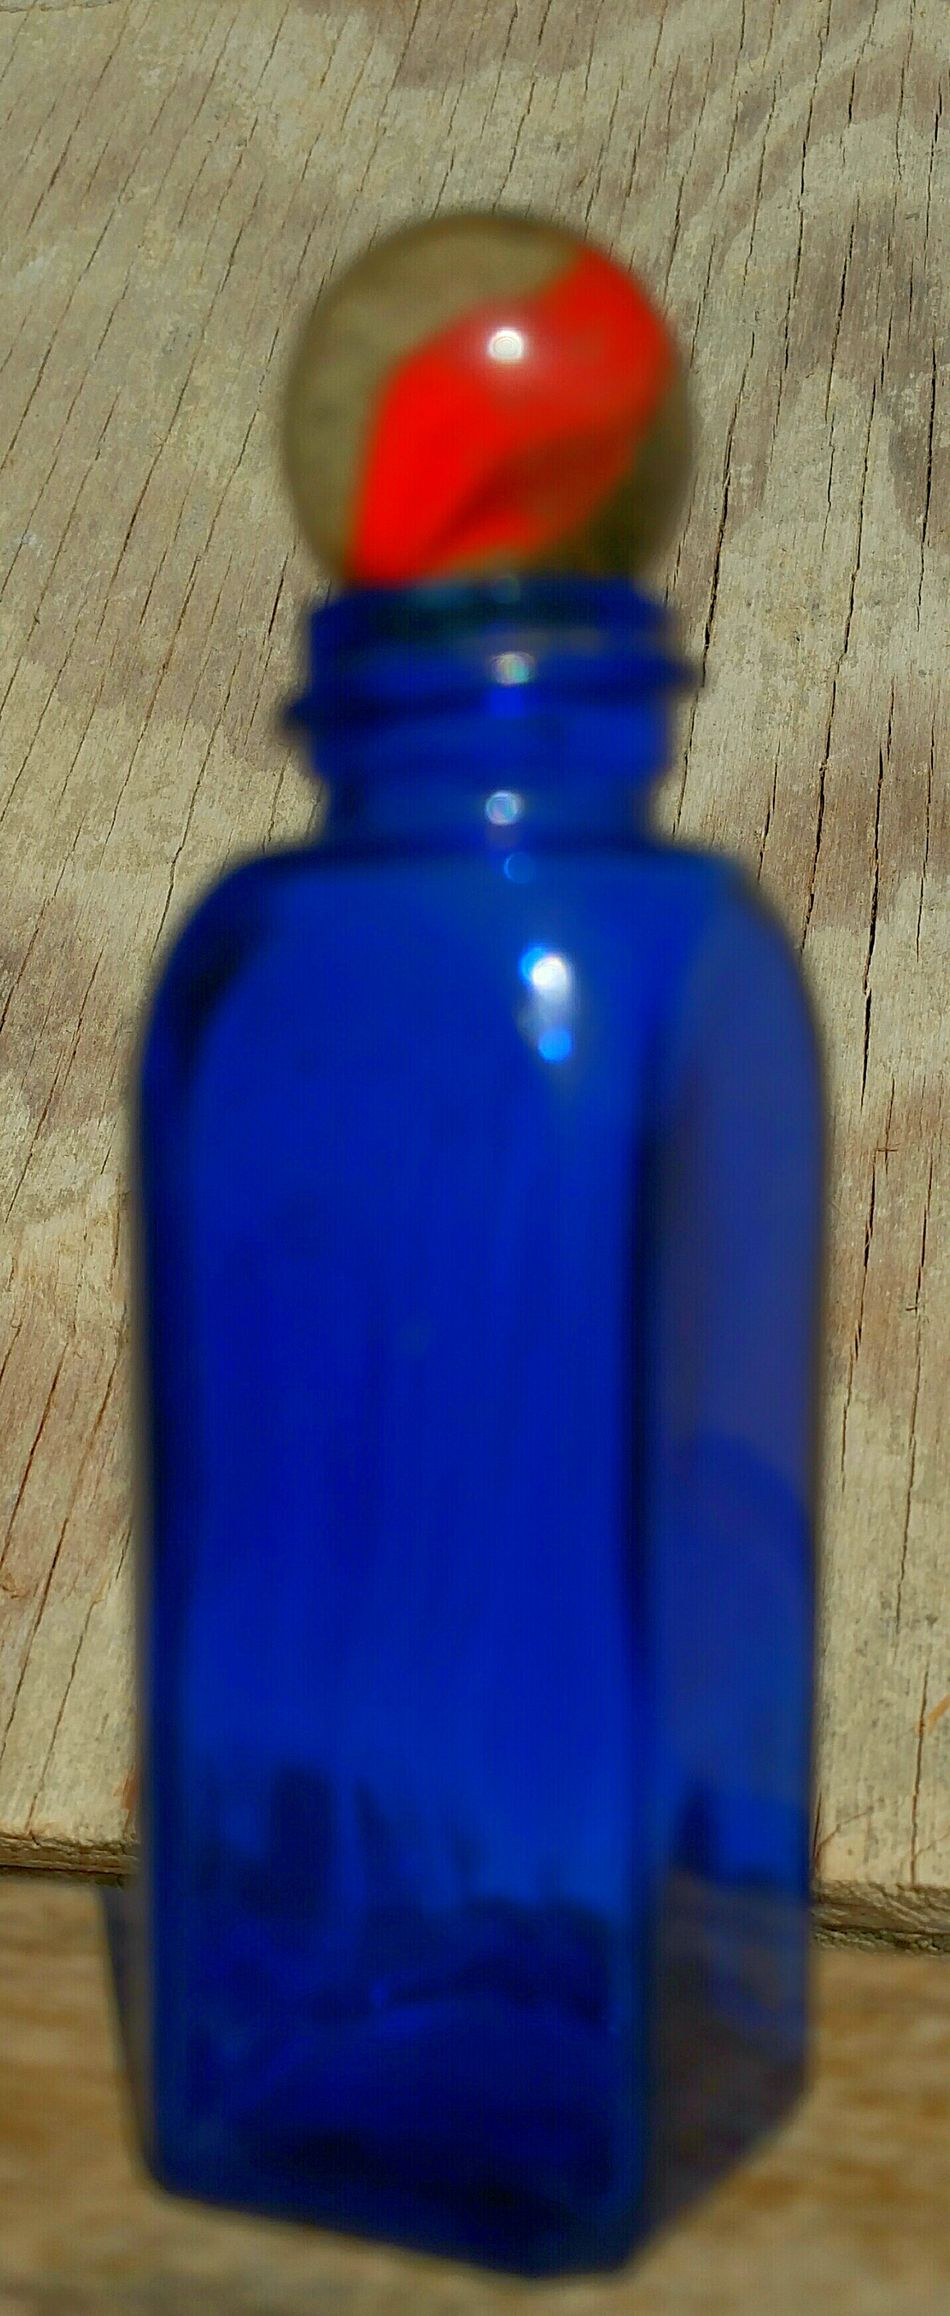 Blue Wave Blue Bottle Orange Striped Marble Toys Antique Blue Bottle Vintage Bottle Vintage Toys Old Bottle Cobolt Blue Cobolt Glass Old Colbolt Bottle Vintage Colbolt Blue Bottle Old Glass